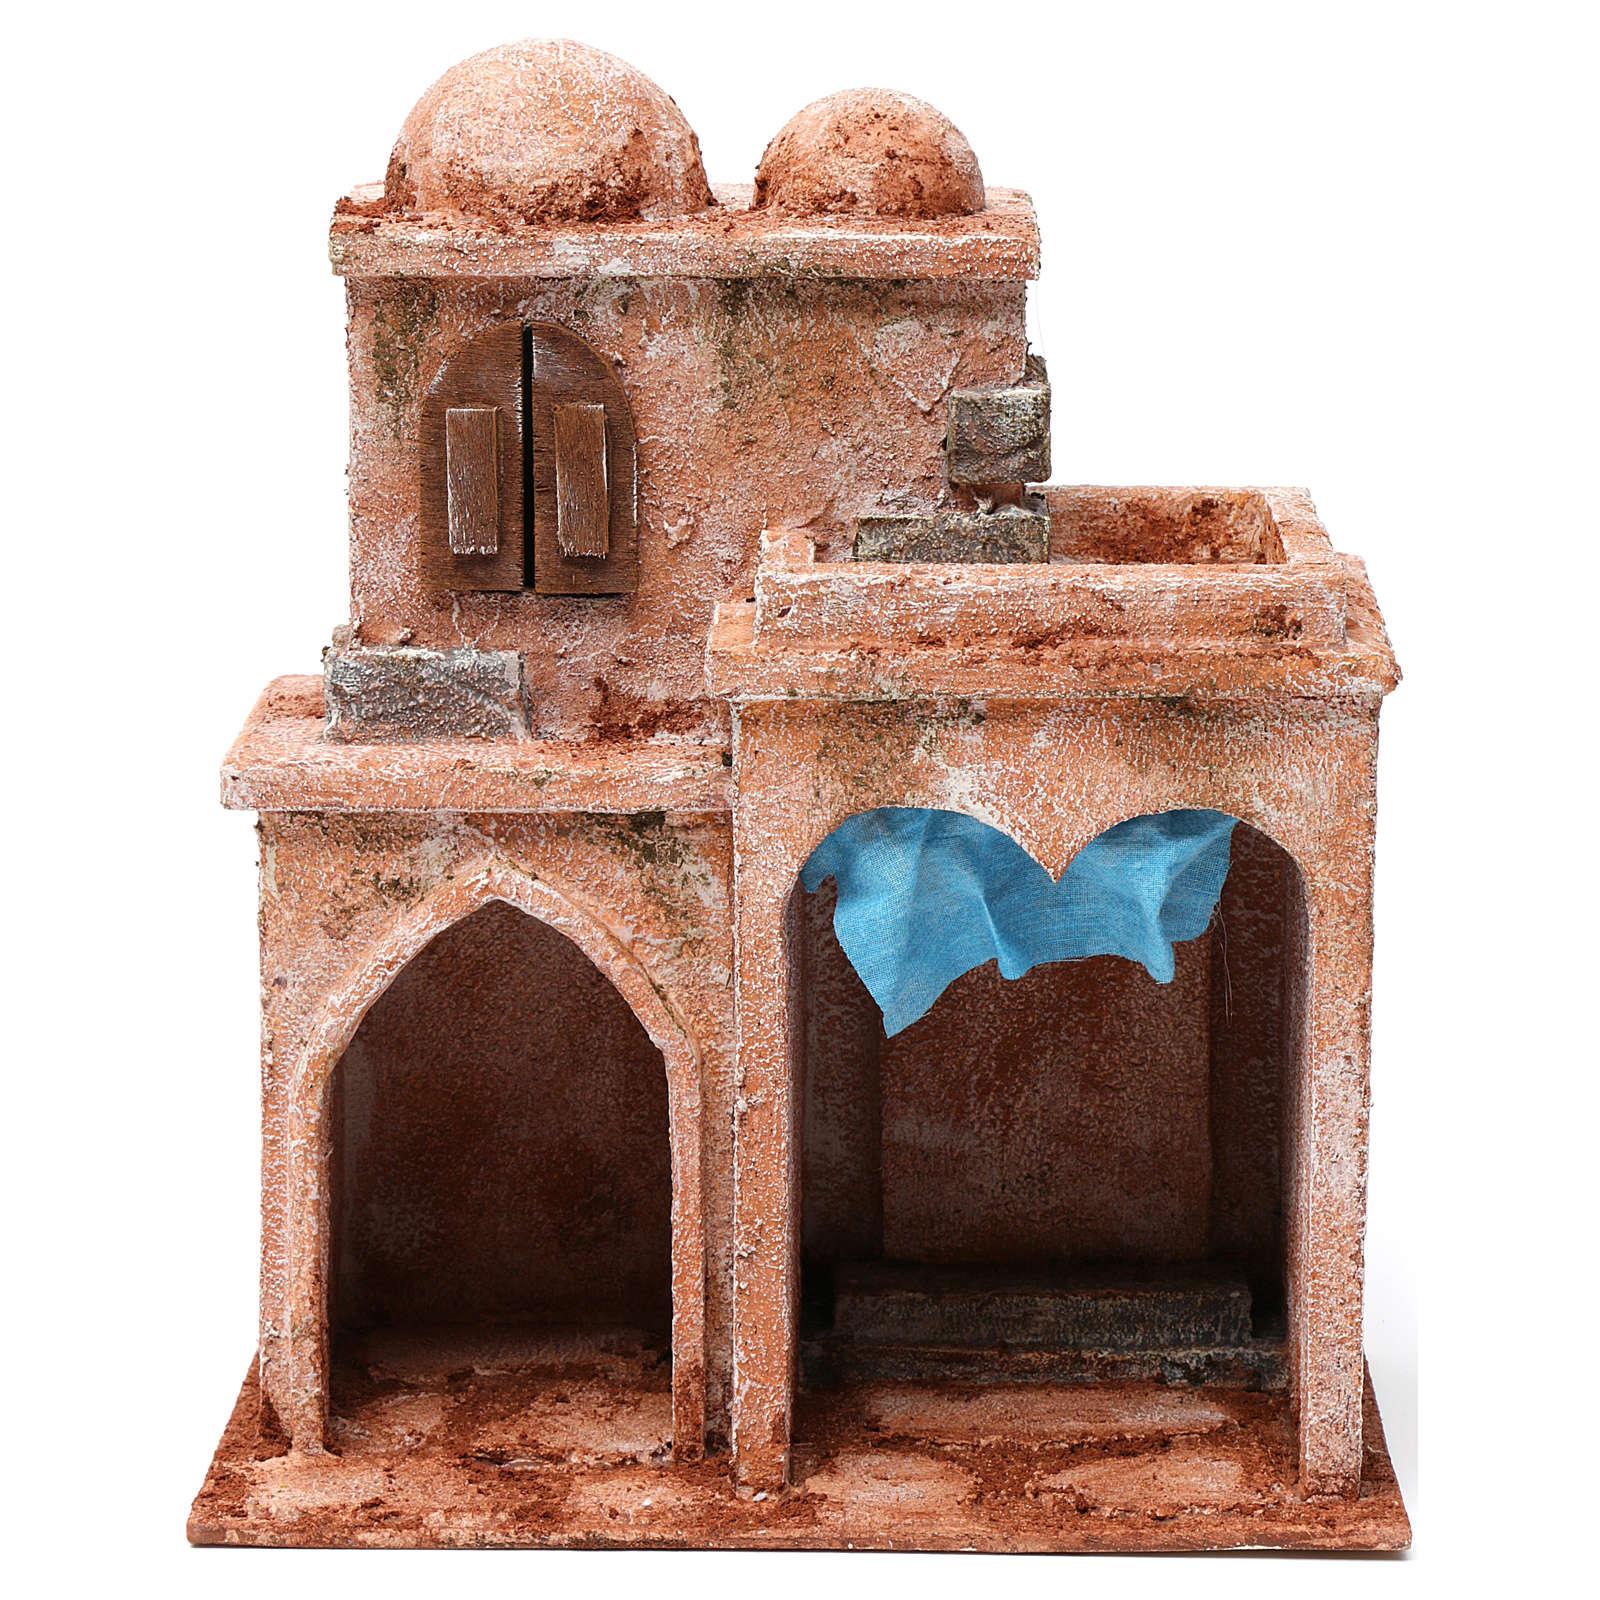 Casa araba doppia cupola doppio porticato tenda azzurra presepe 10 cm 30X25X15 4